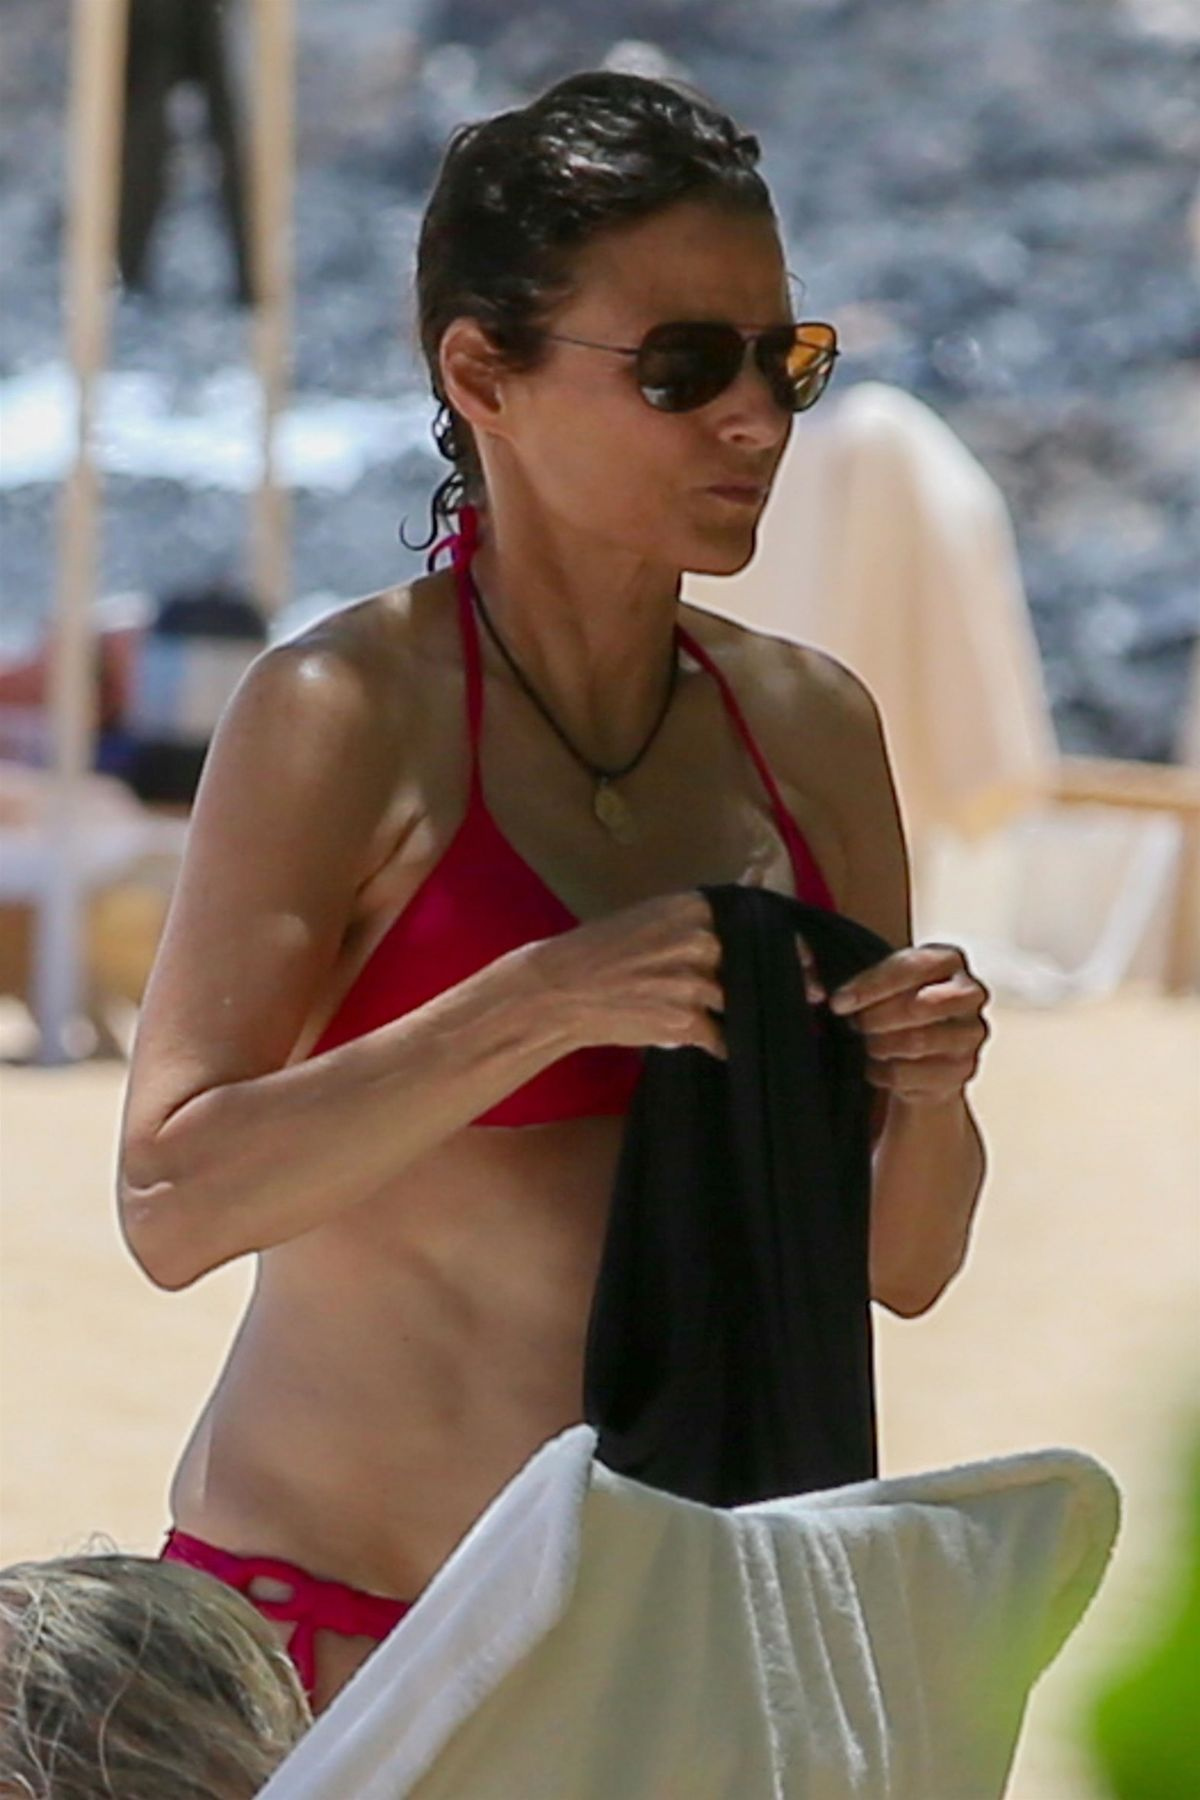 Julia Louis-Dreyfus Topless